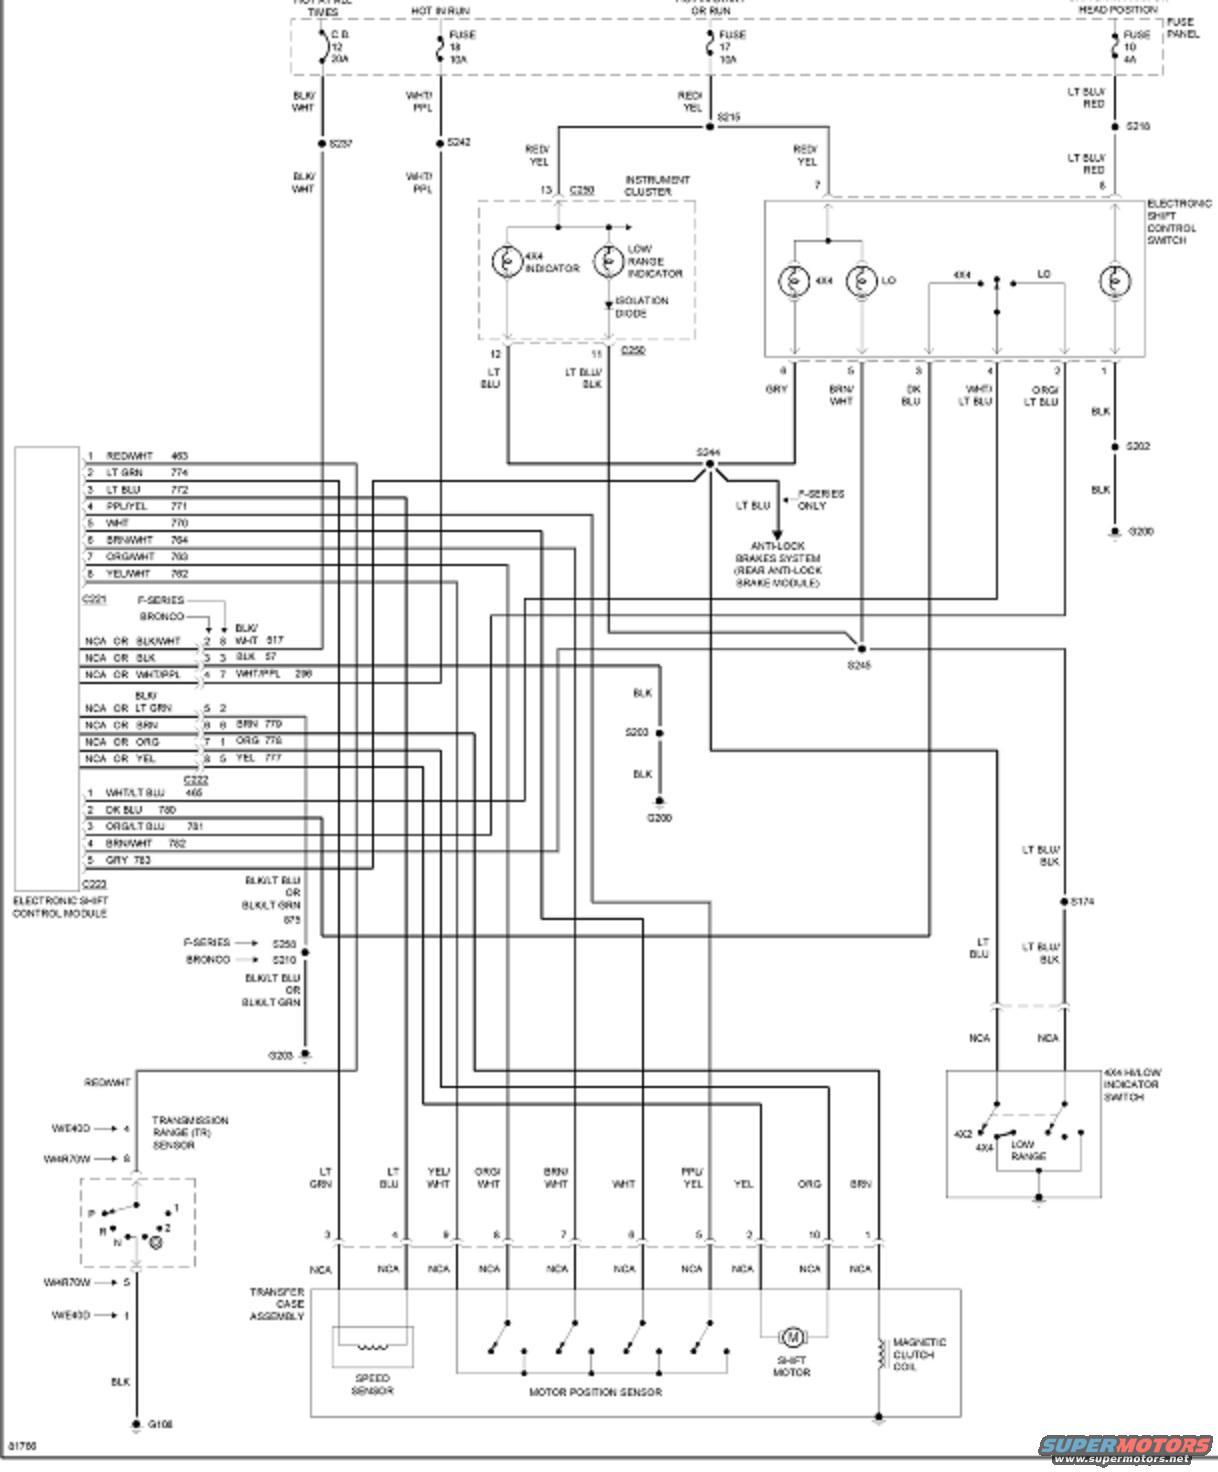 1992 ford bronco radio wiring diagram